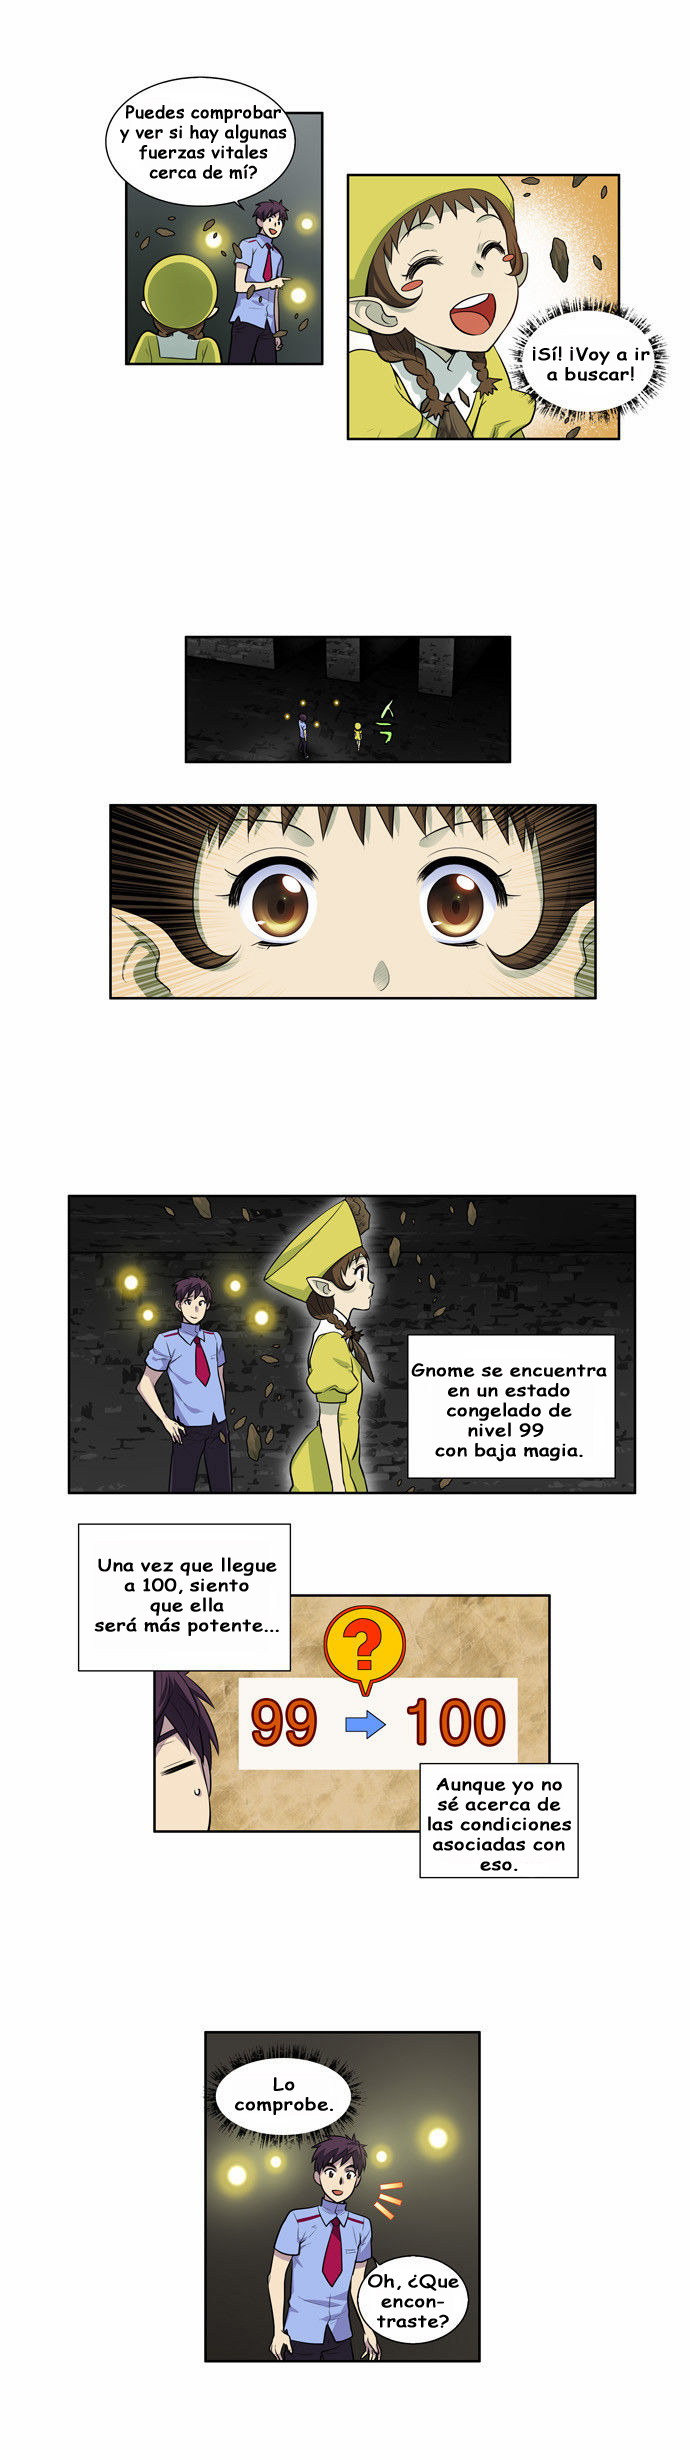 http://c5.ninemanga.com/es_manga/61/1725/396909/e78c666d9e6c8aaf2cb2044b8960c4d2.jpg Page 2